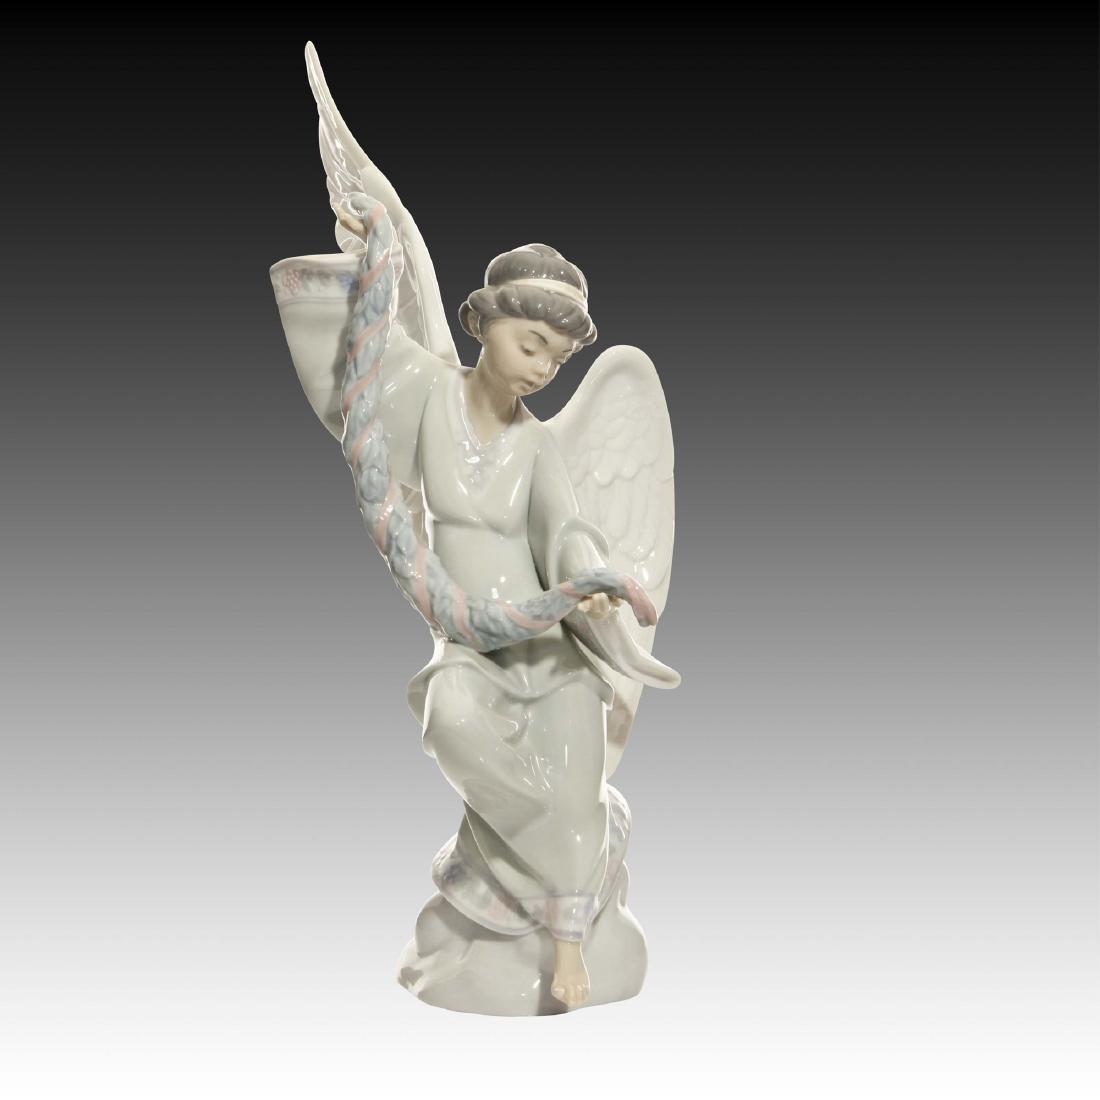 Lladro Angel with Garland Figurine 6133 Retired